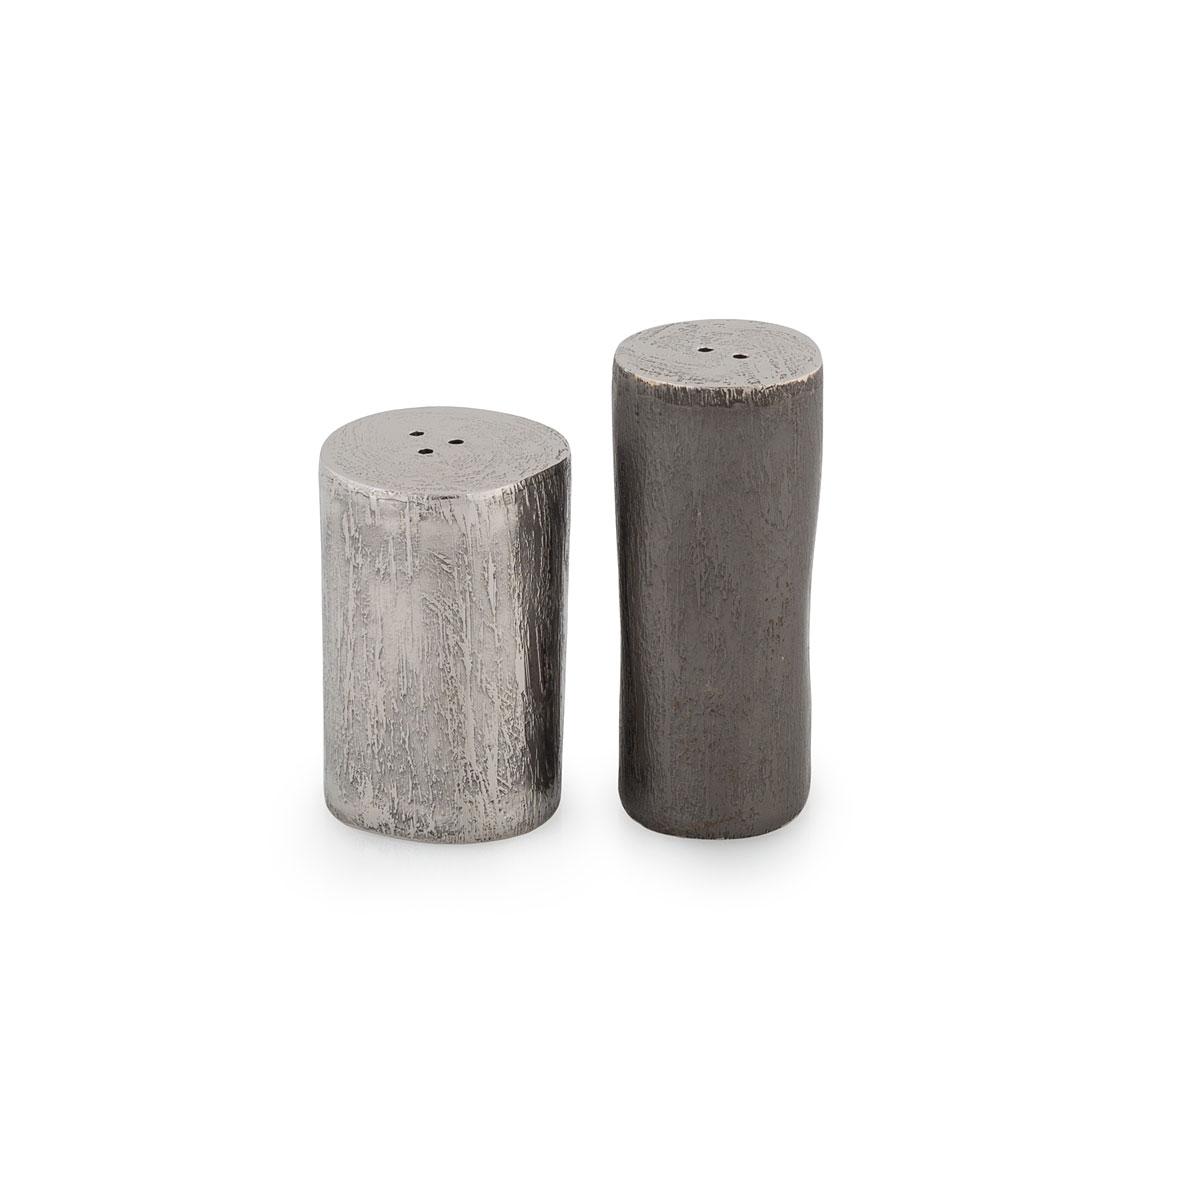 Michael Aram Driftwood Salt and Pepper Set